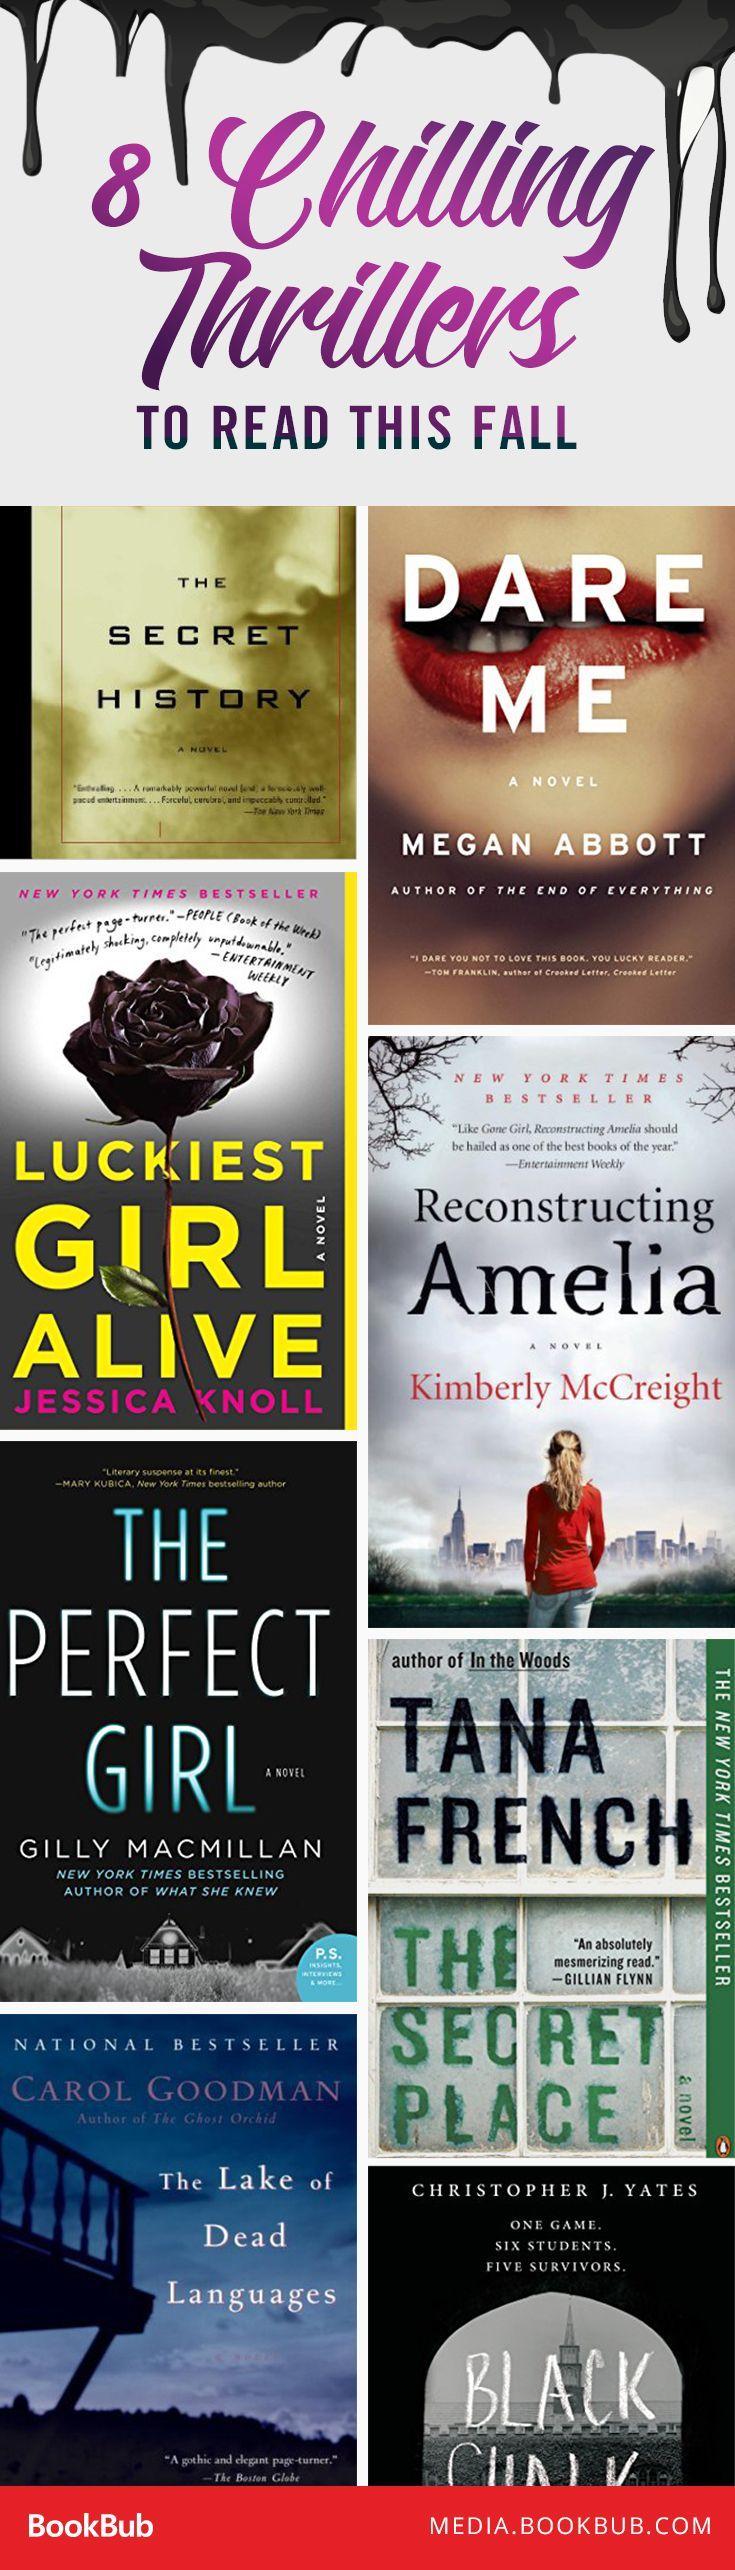 8 suspenseful thriller books to read this fall.